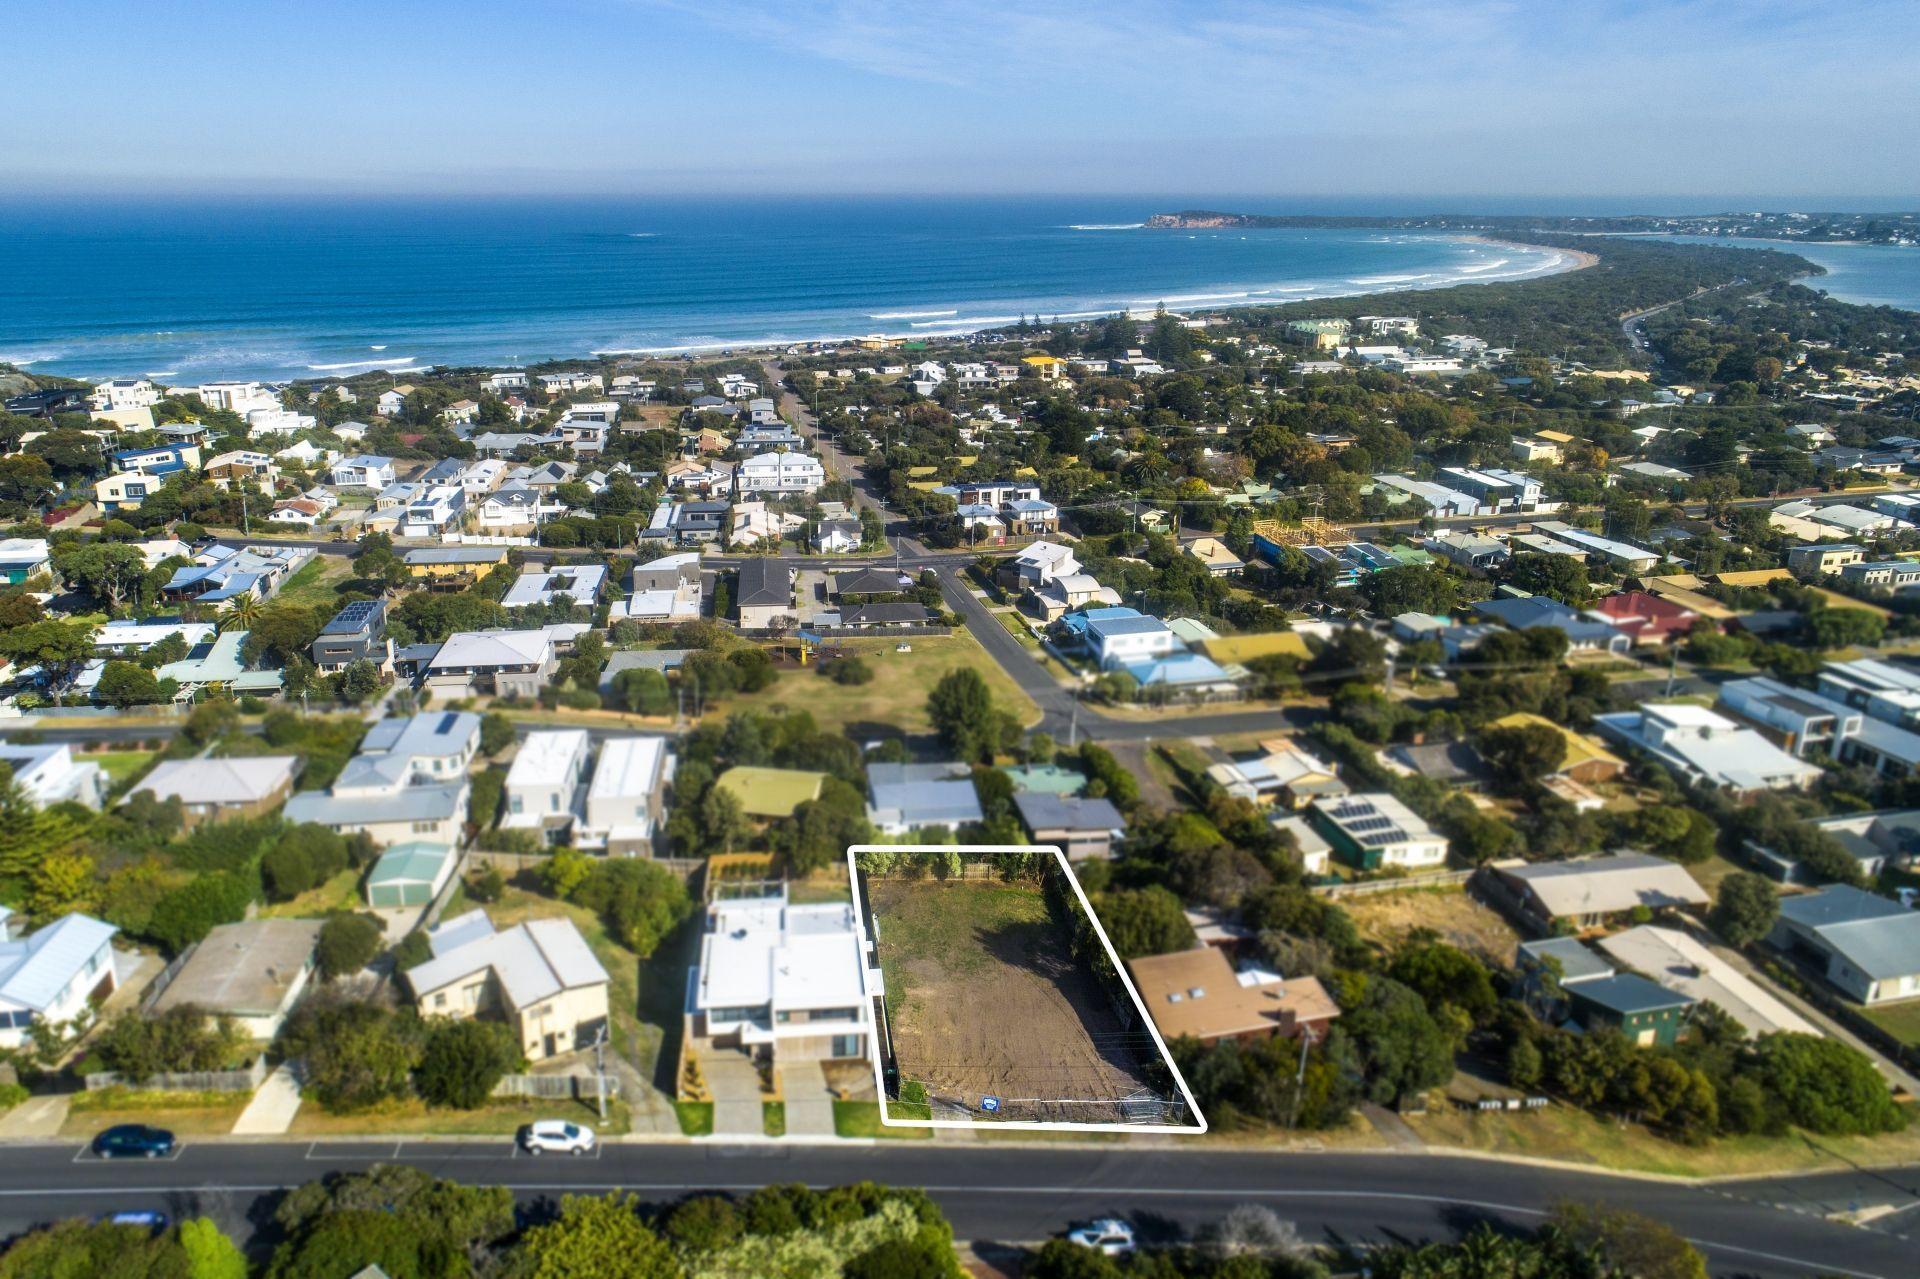 38 The Terrace, Ocean Grove VIC 3226